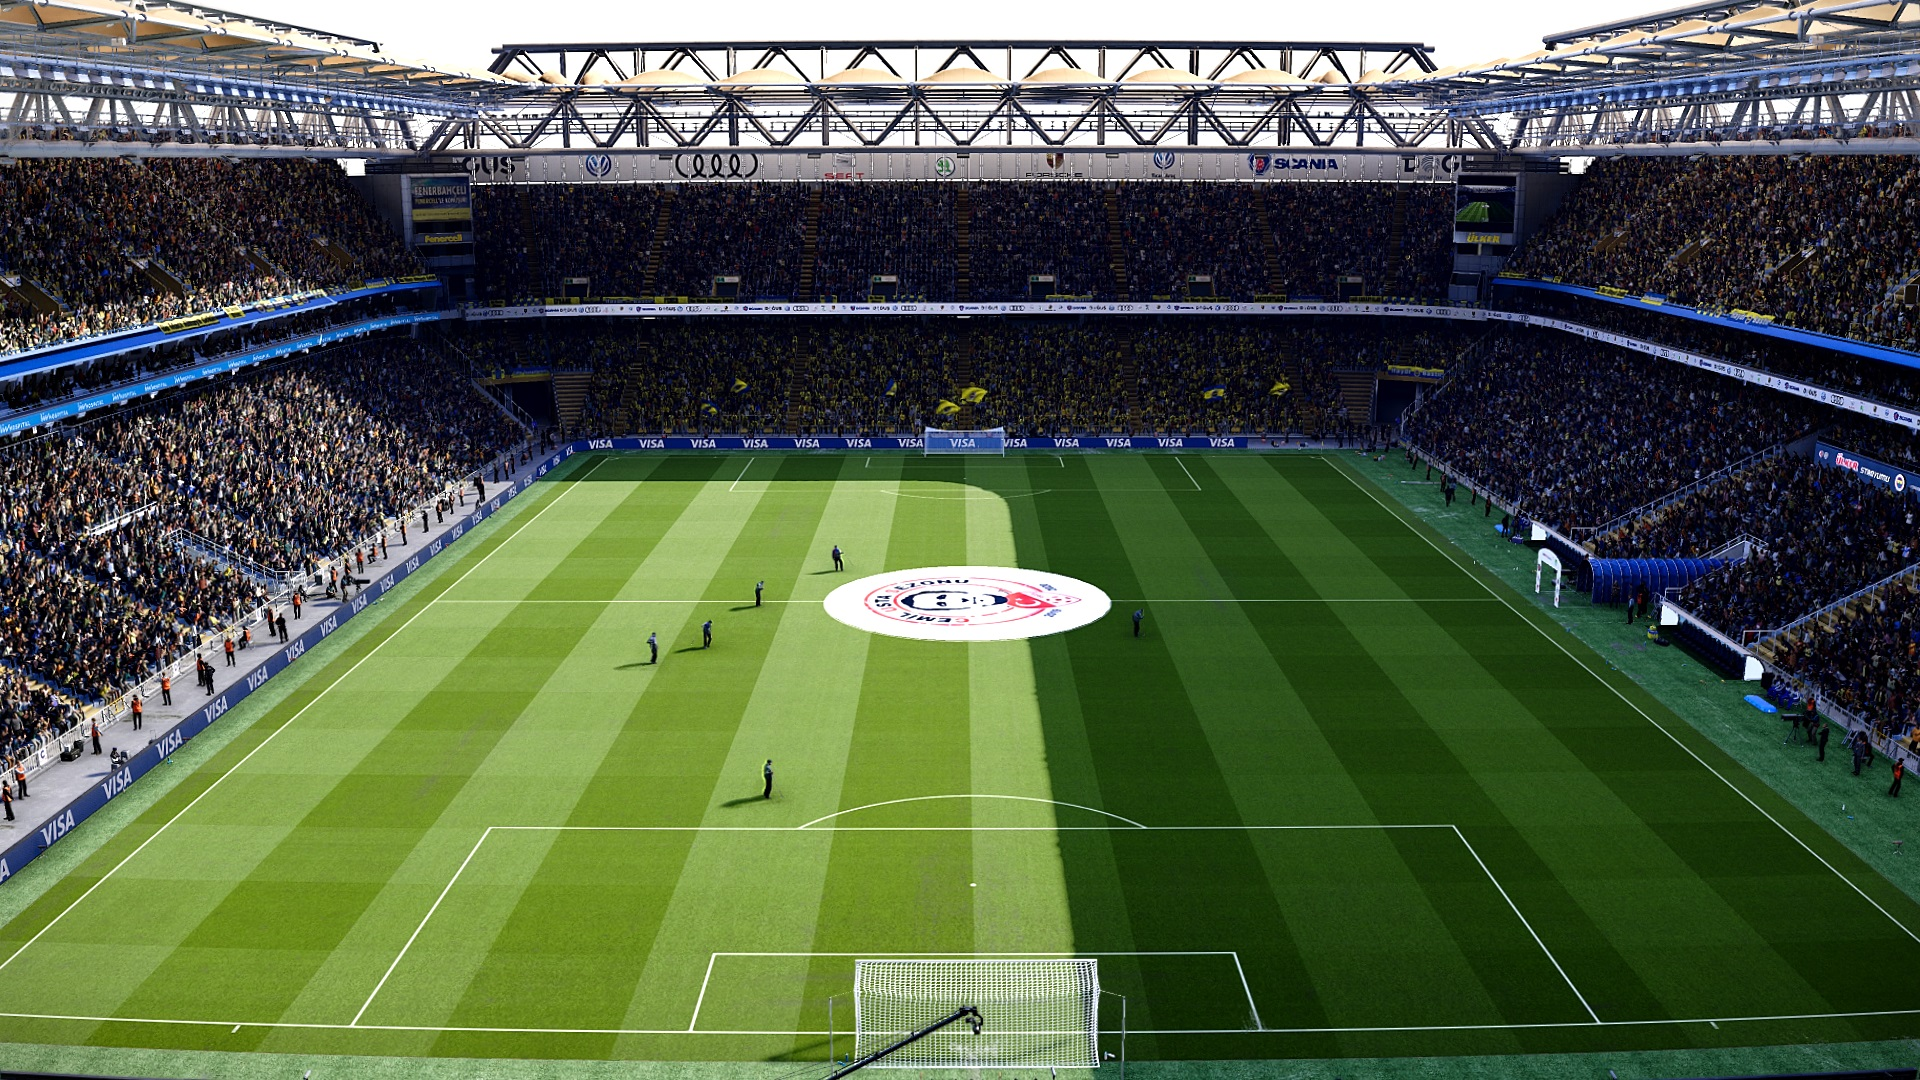 PES 2021 Şükrü Saracoğlu Stadium - Fenerbahçe